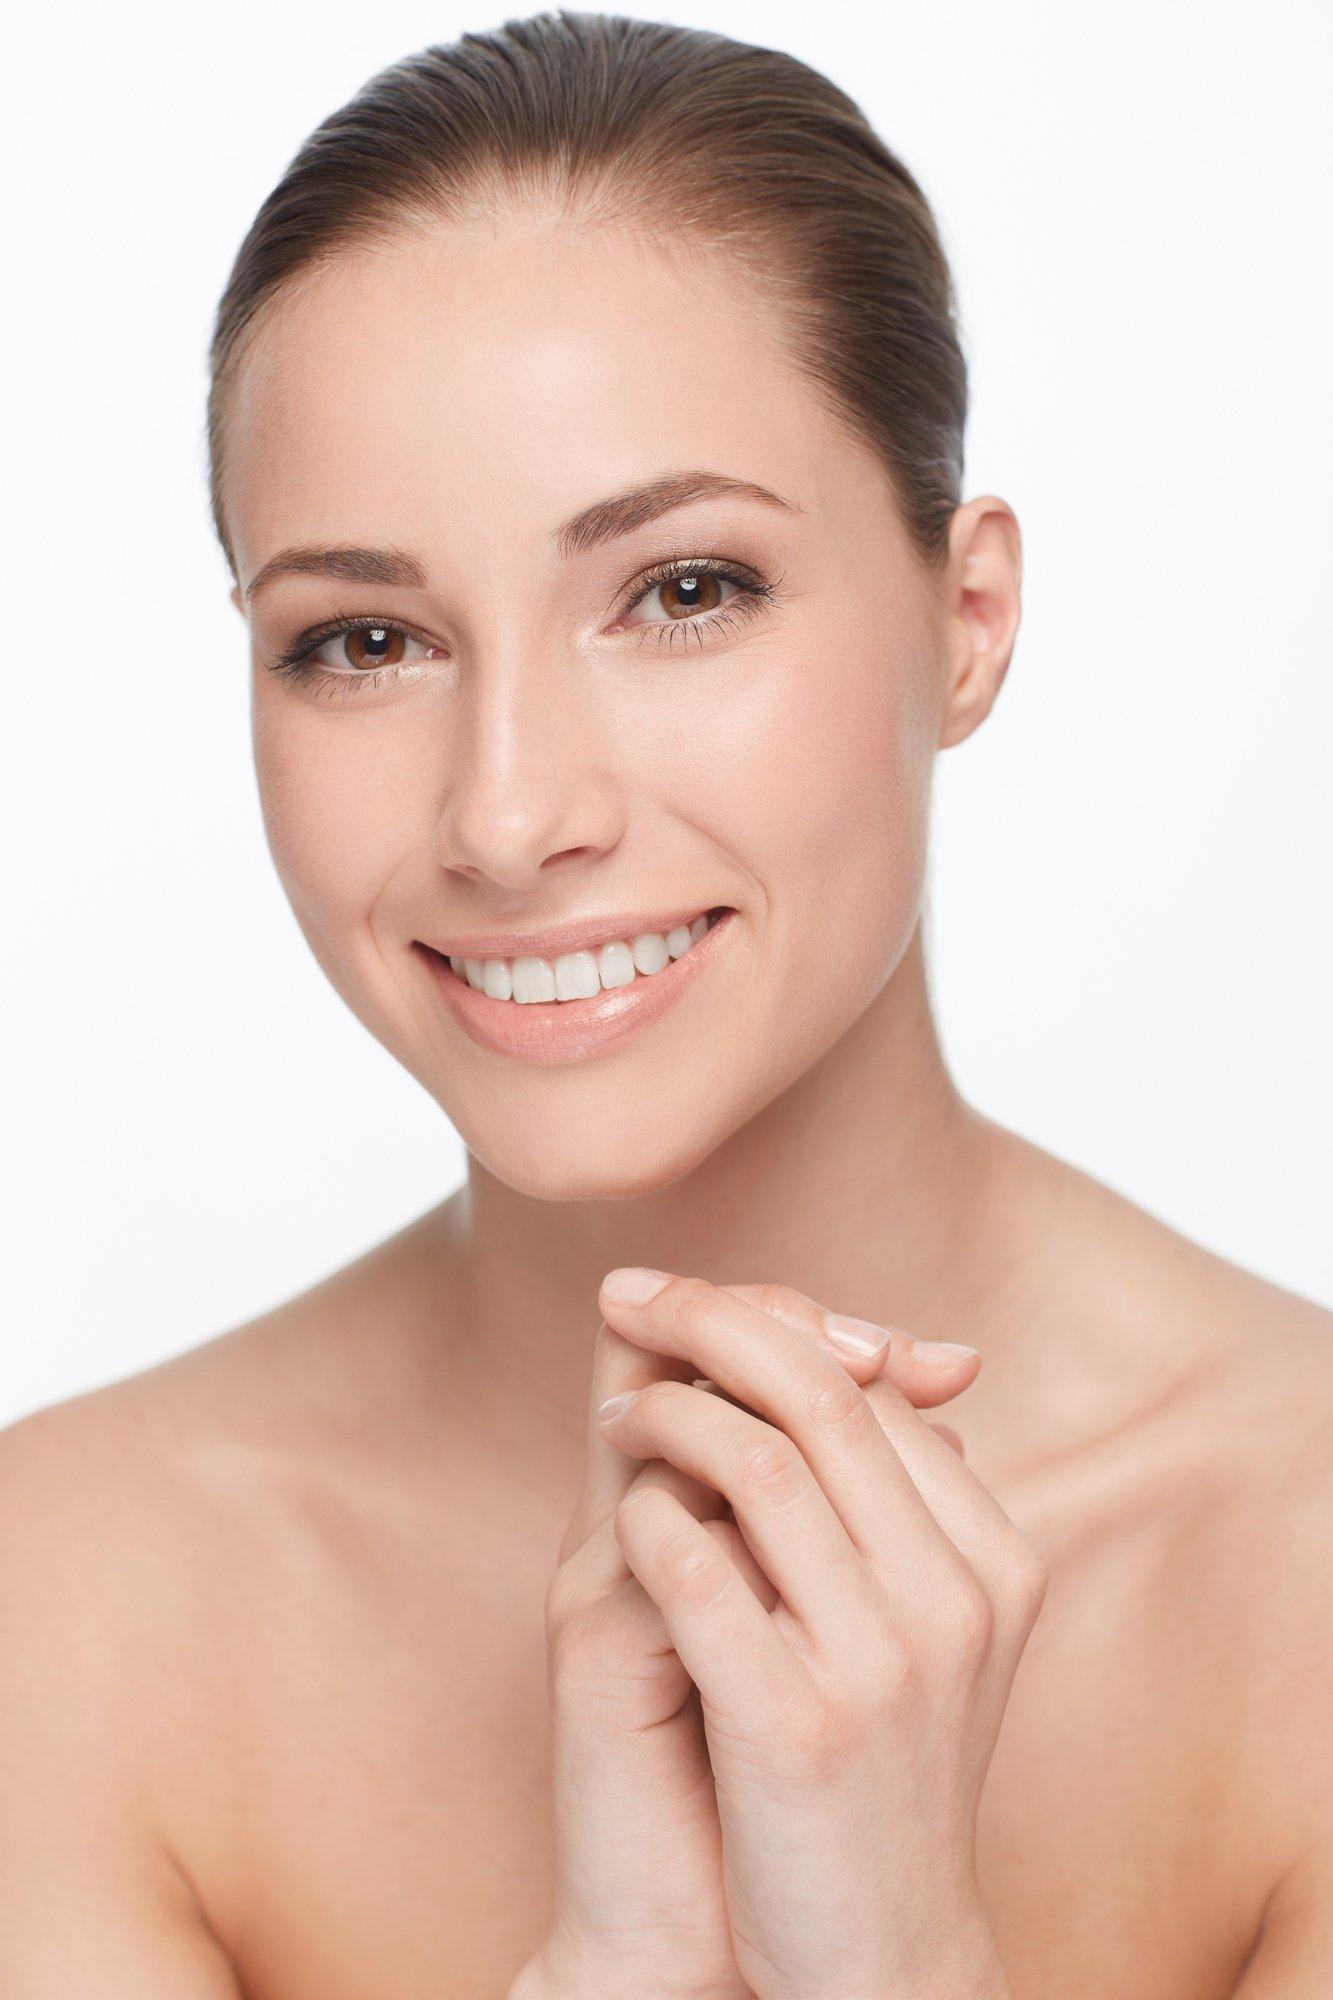 places skin bliss health wellness antonio